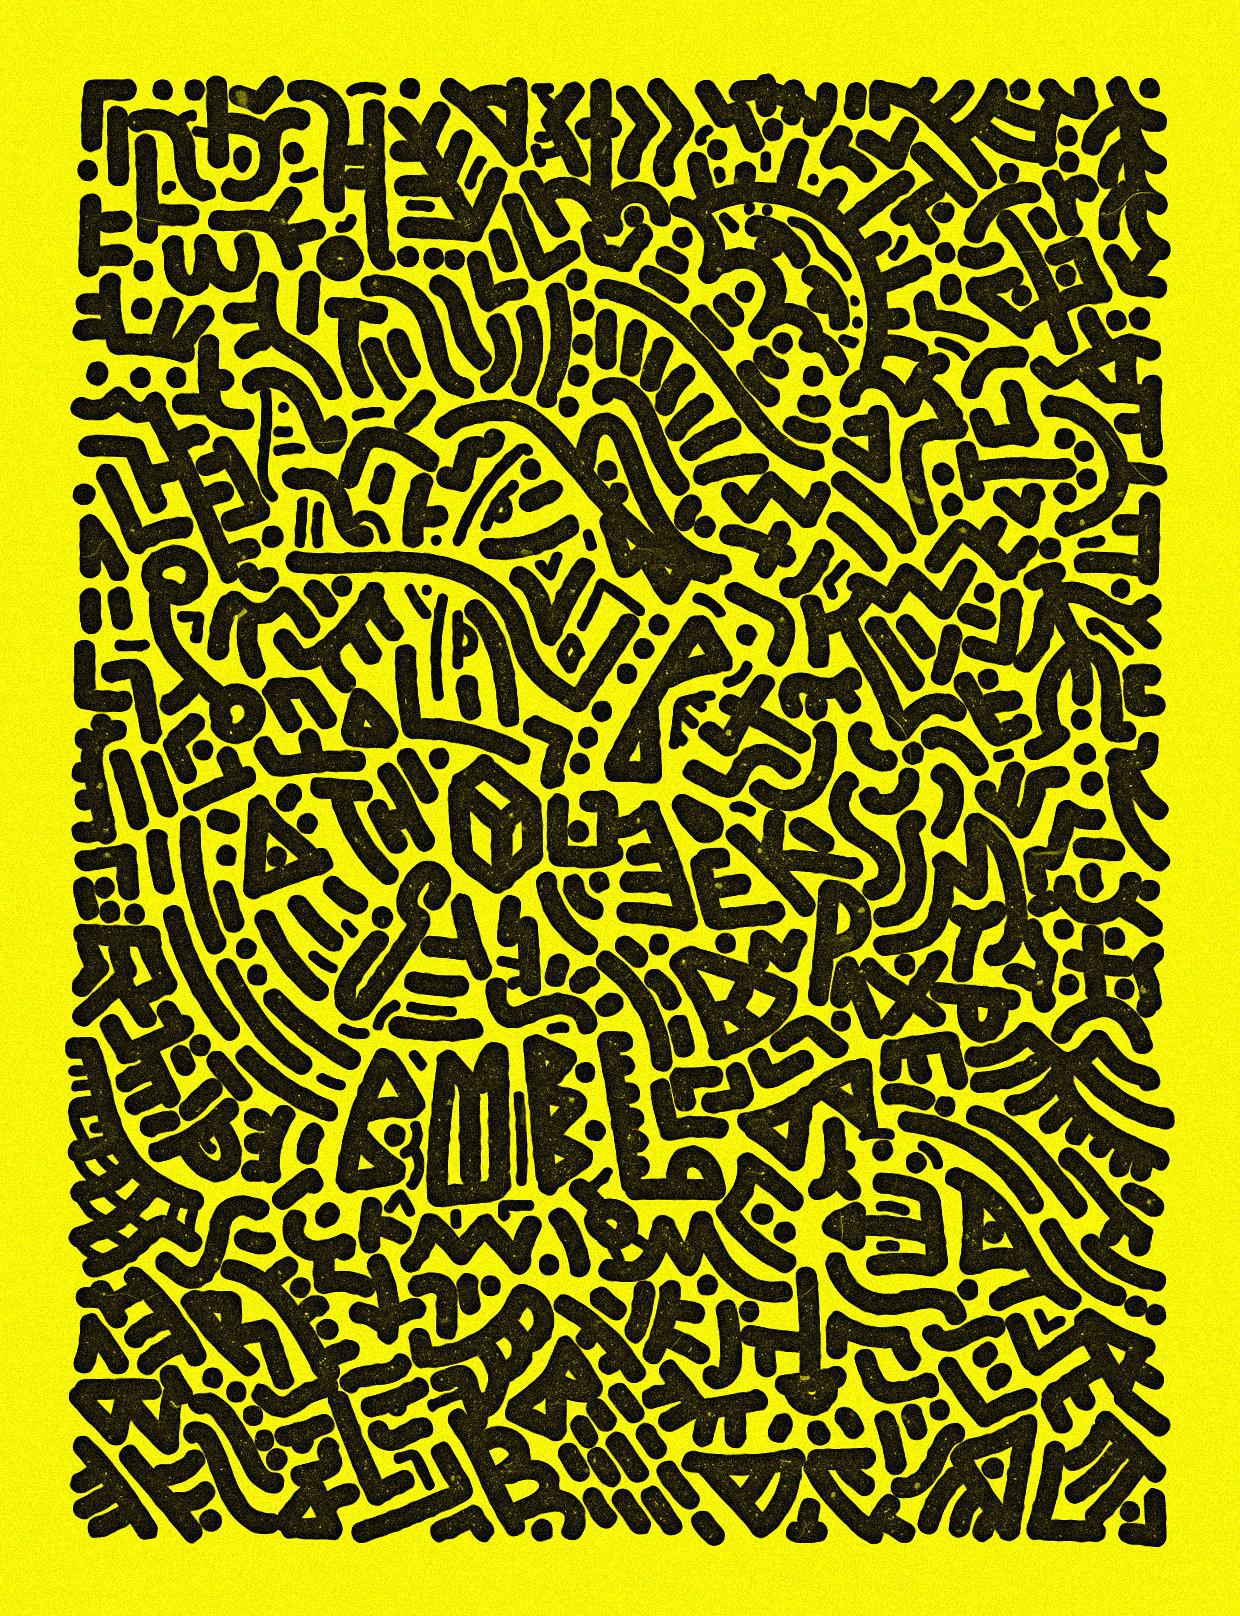 lines lines2 somelines texture  - gaston-camon | ello